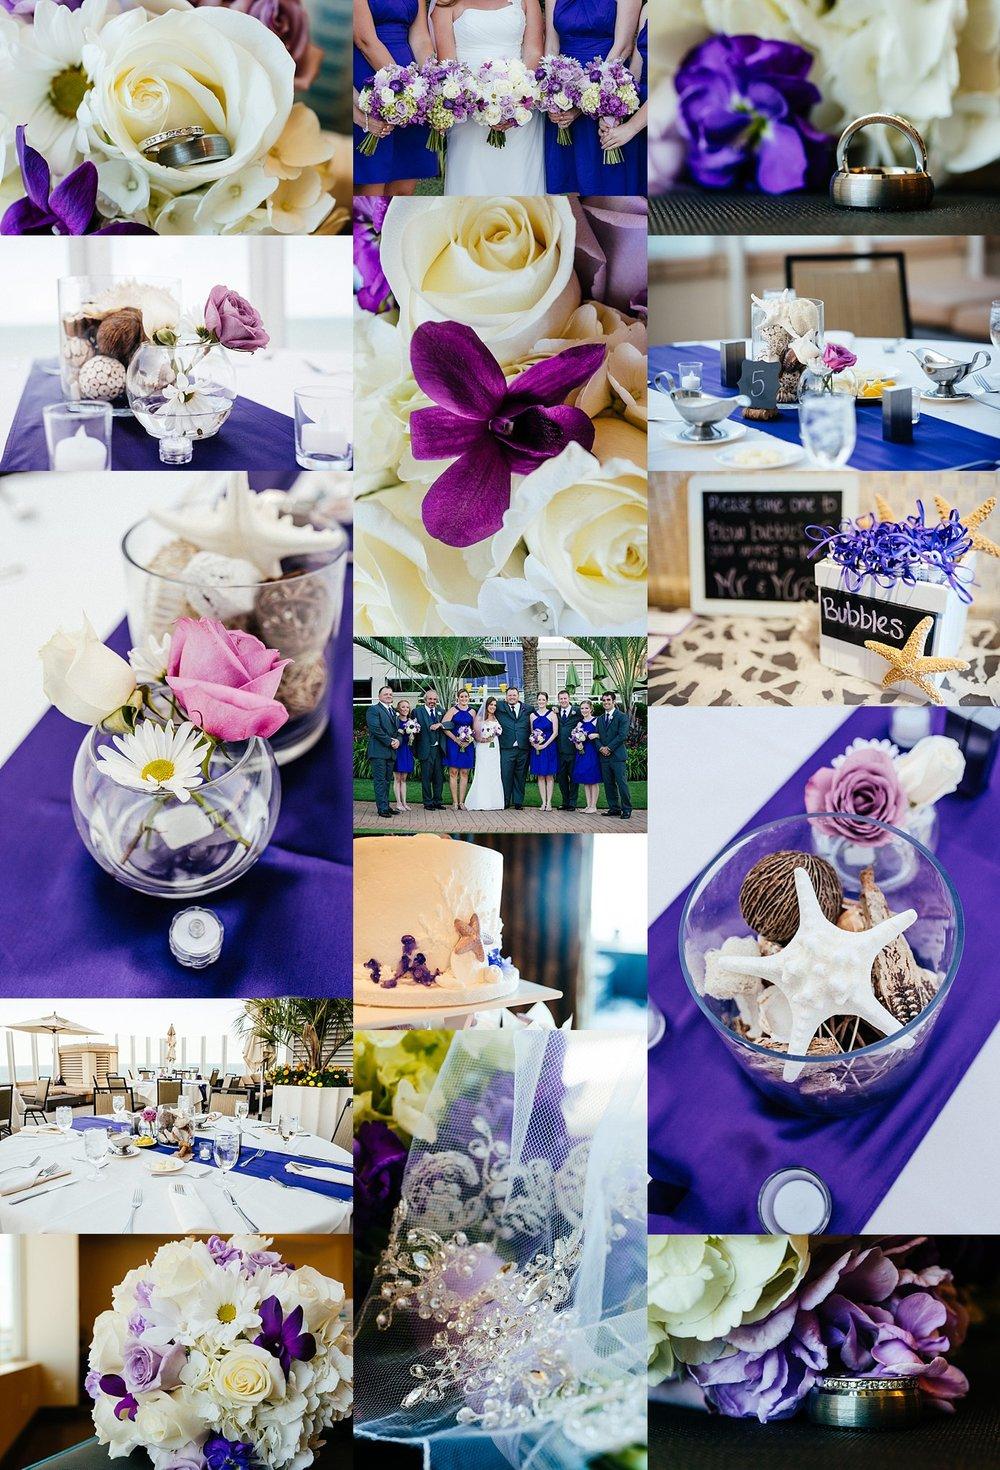 violet-purple-2018-wedding-color-trend-wedding-inspiration-va-wedding-photographer-melissa-bliss-photography-virginia-beach-norfolk-weddings.jpg